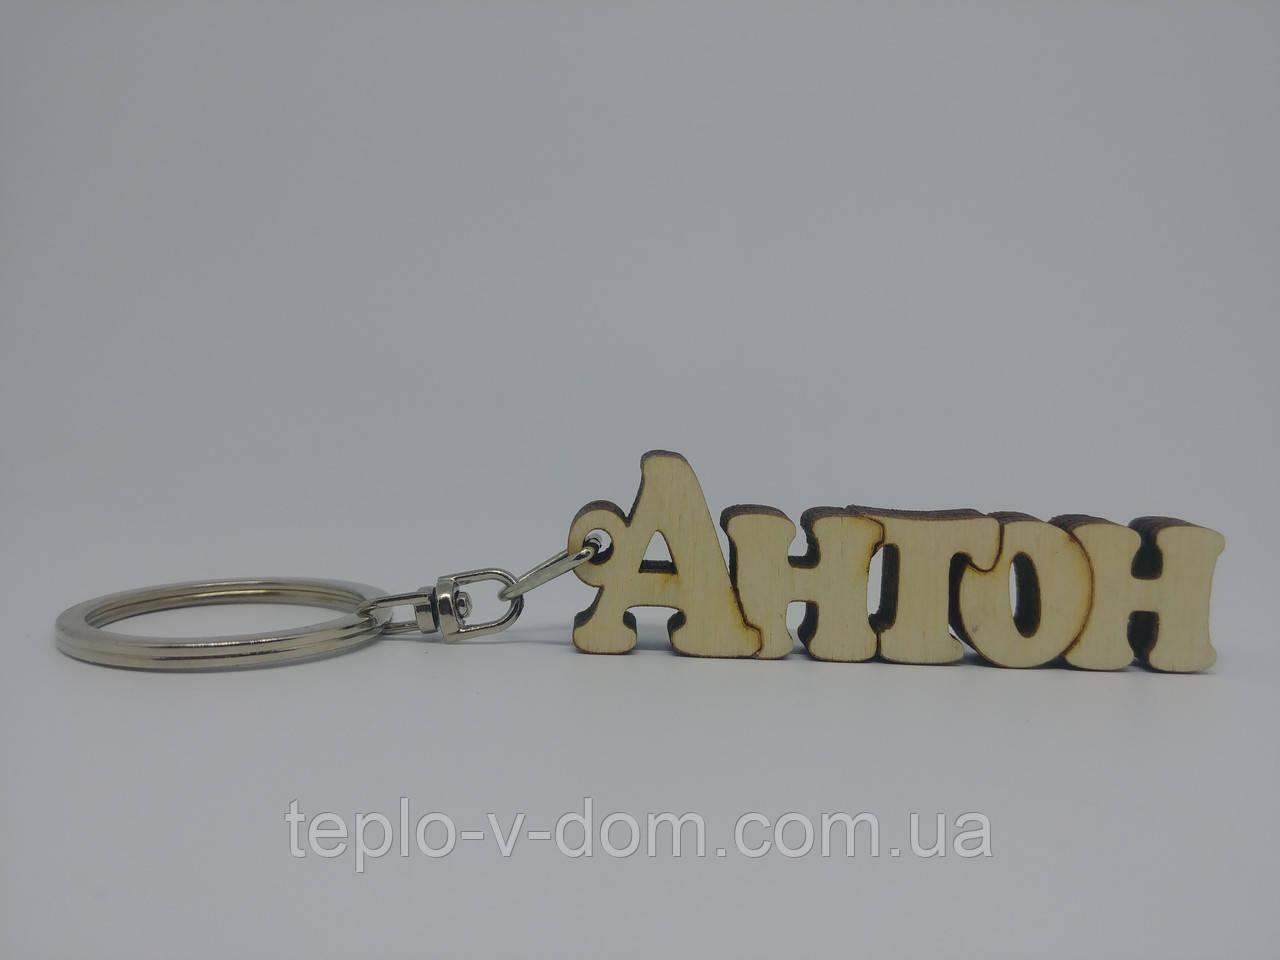 Деревянный брелок Антон